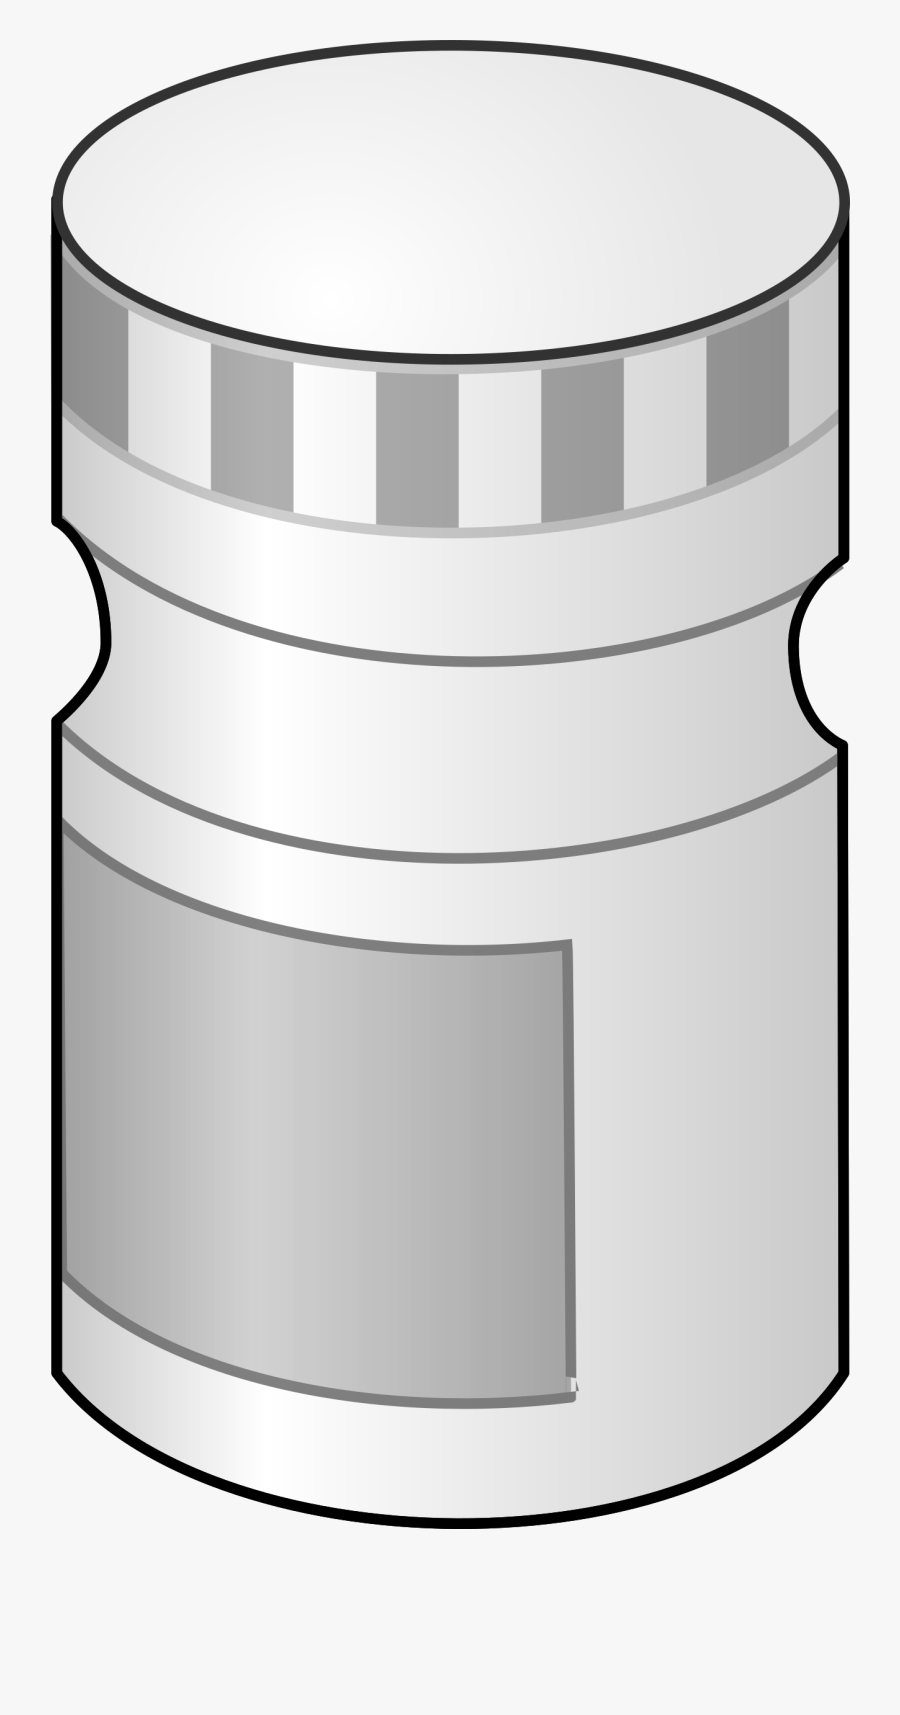 Gambar Animasi Obat Hitam Putih Free Transparent Clipart